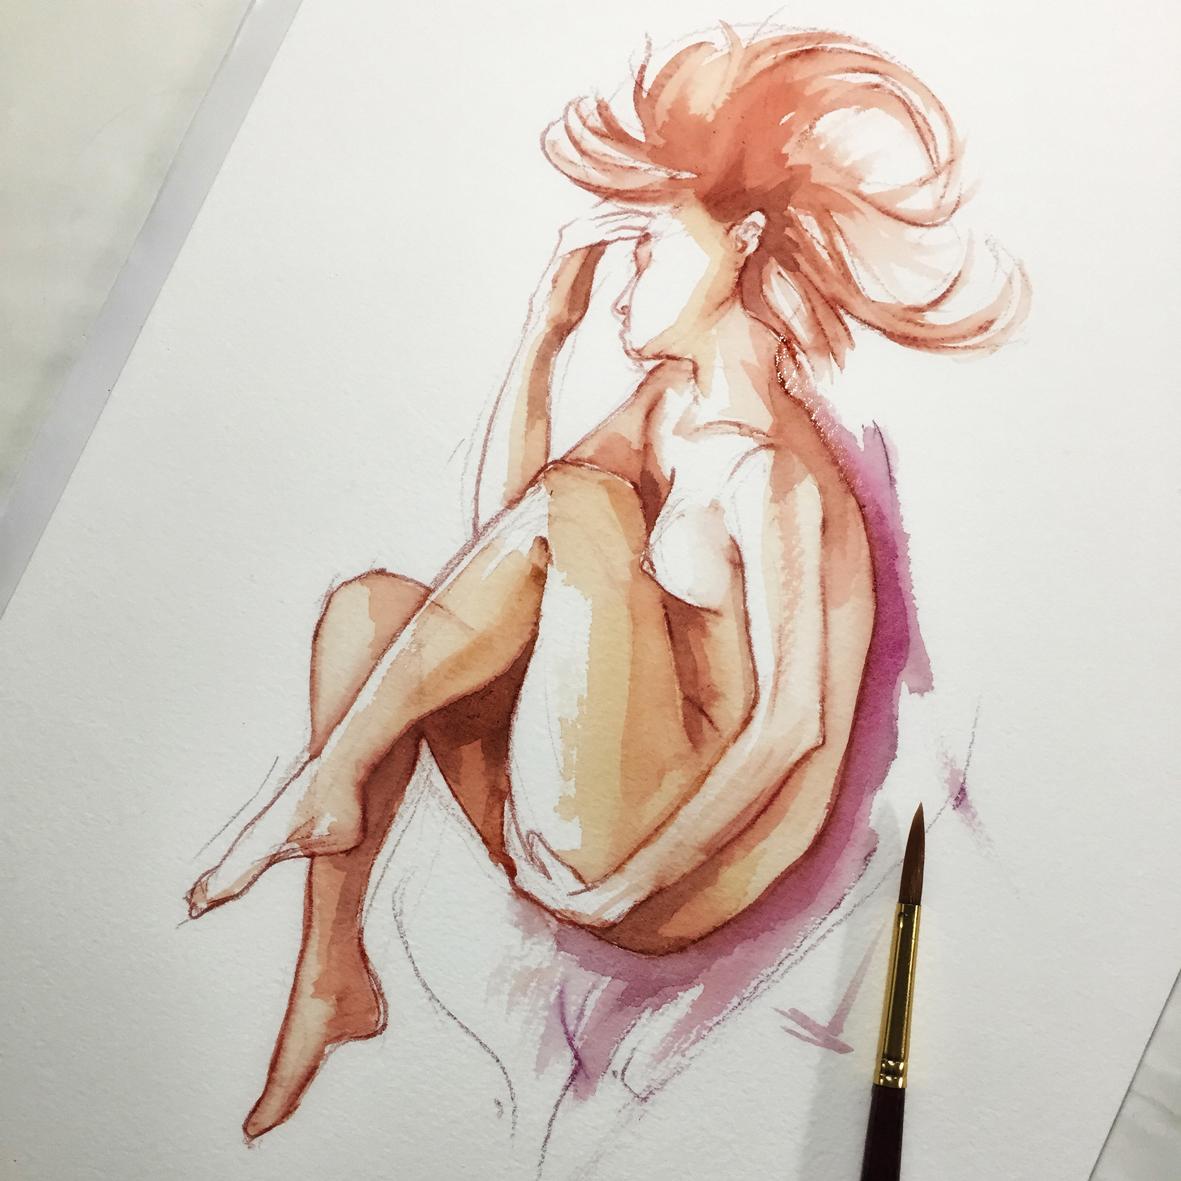 009 Radmila2 Vito Lentini Designer Acquarelli Sketches